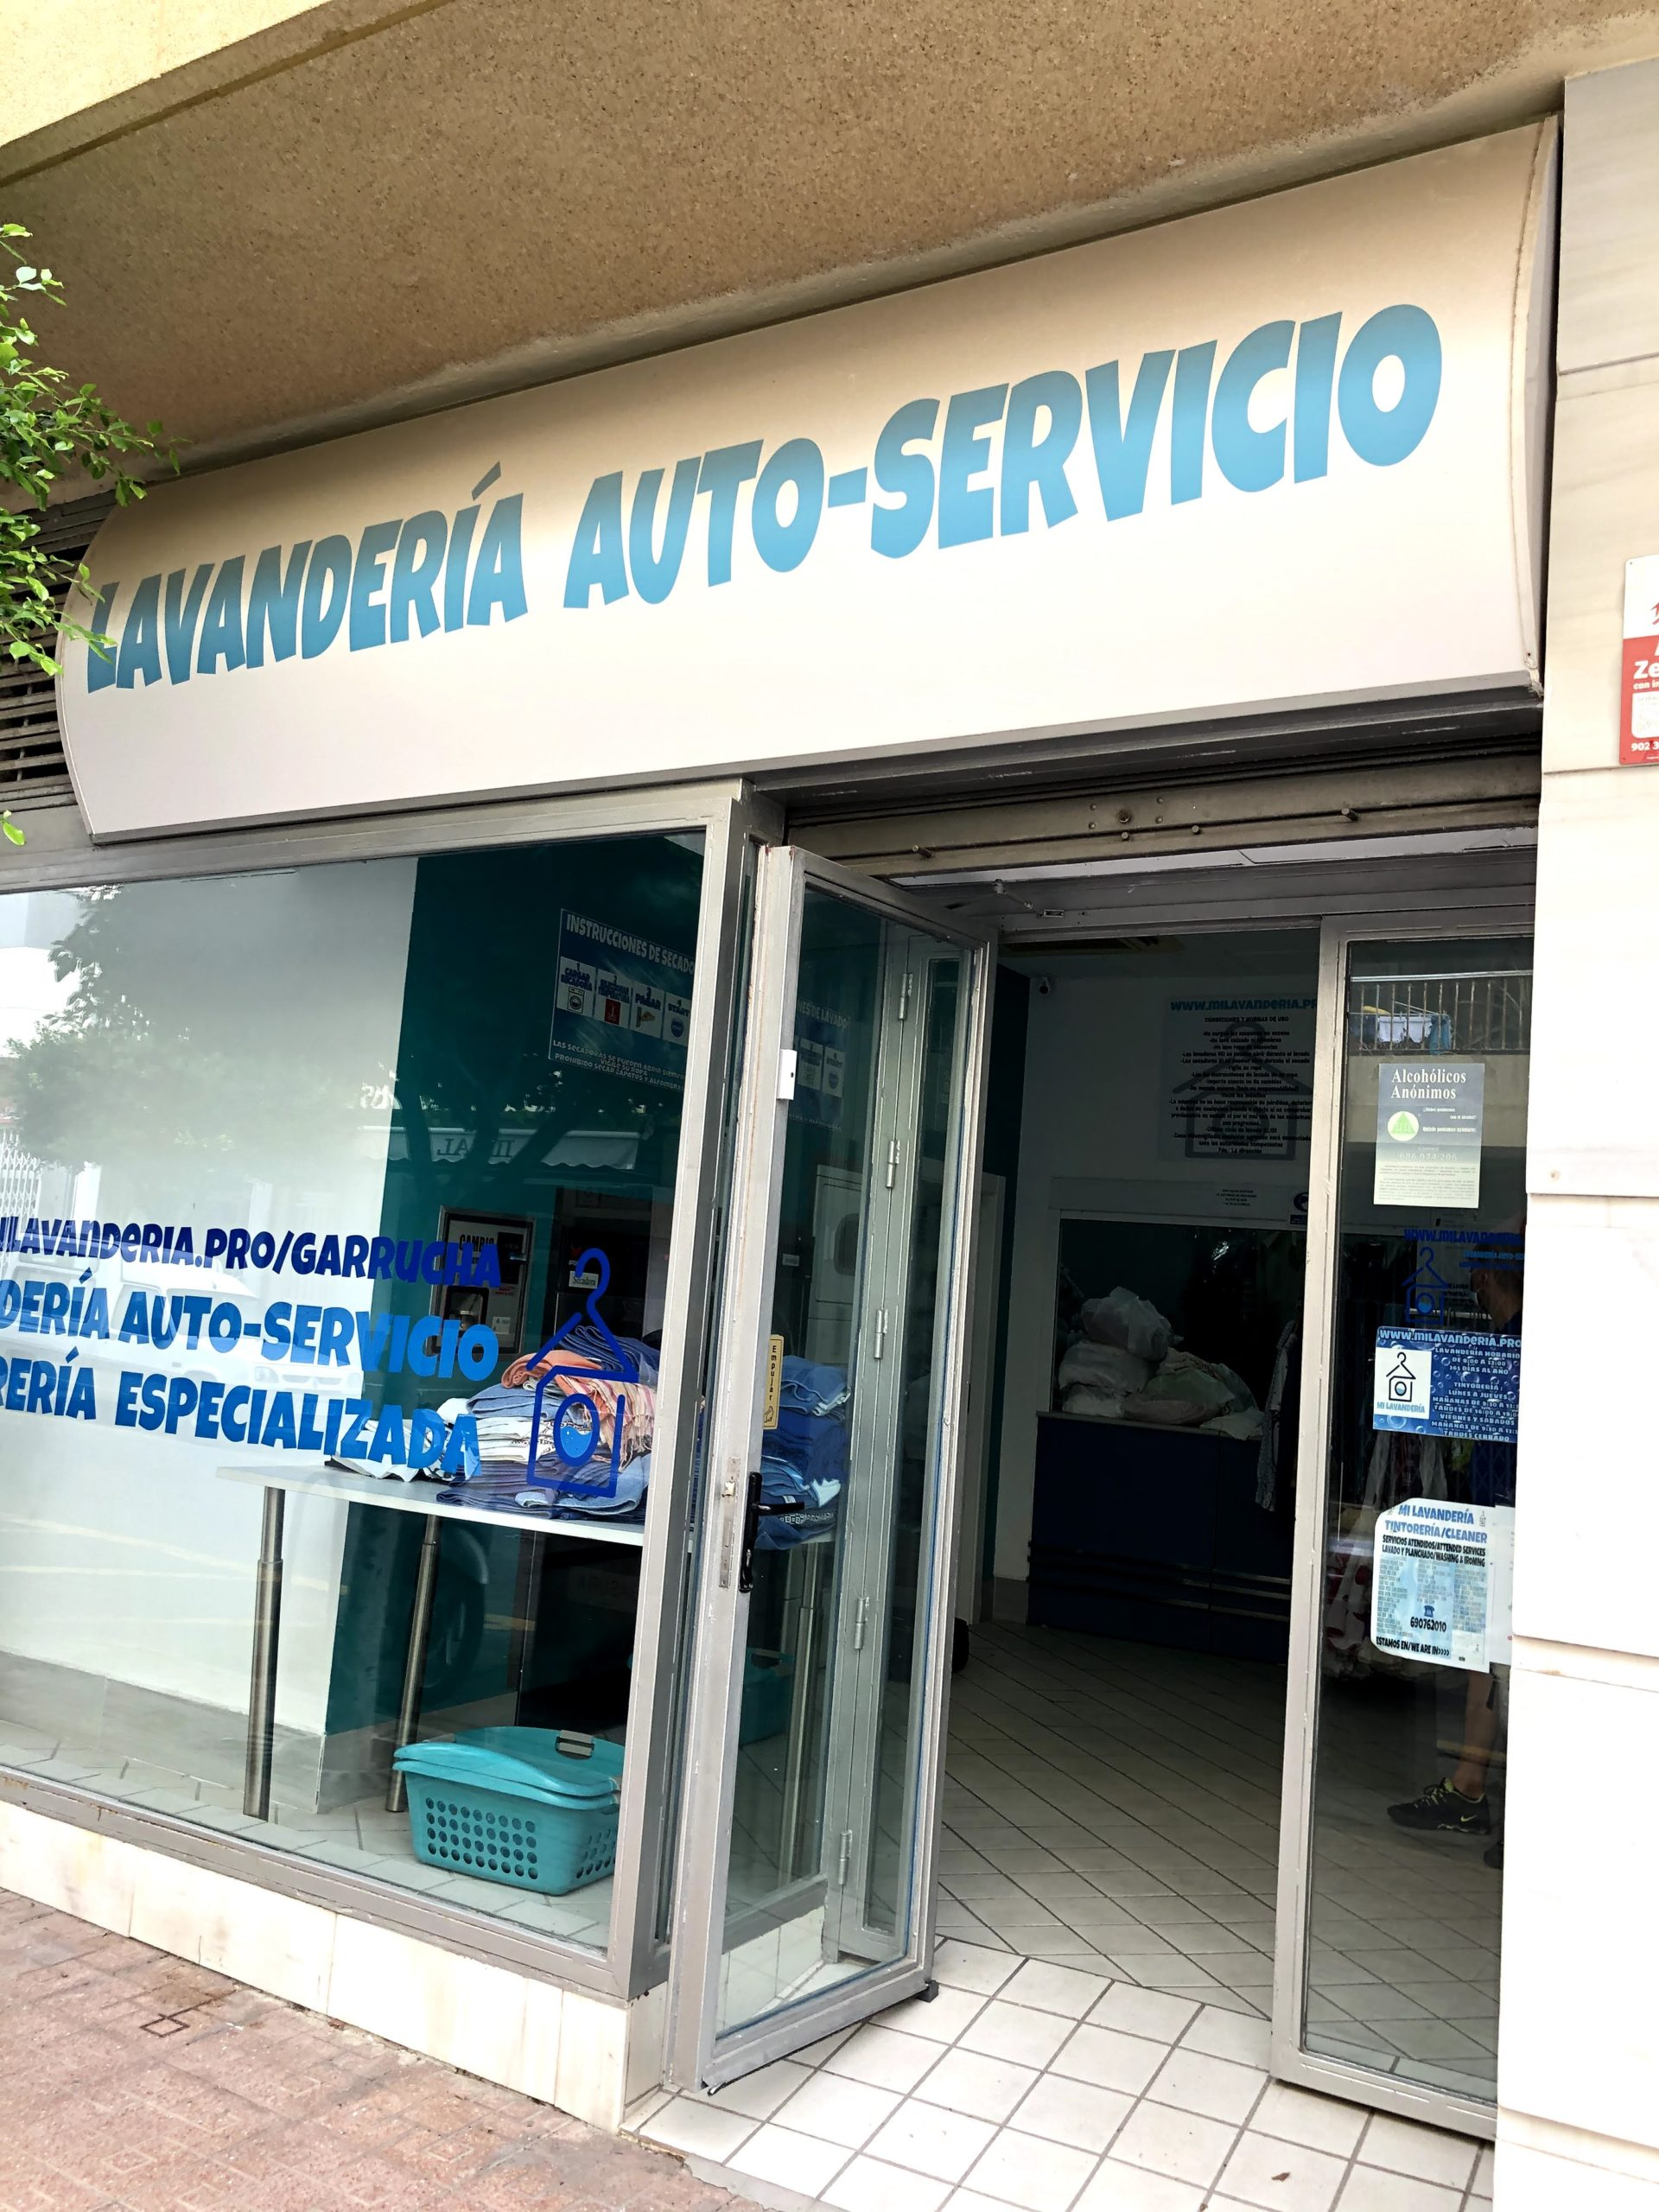 lavanderia_en_garrucha_el_hogar_digital (4)